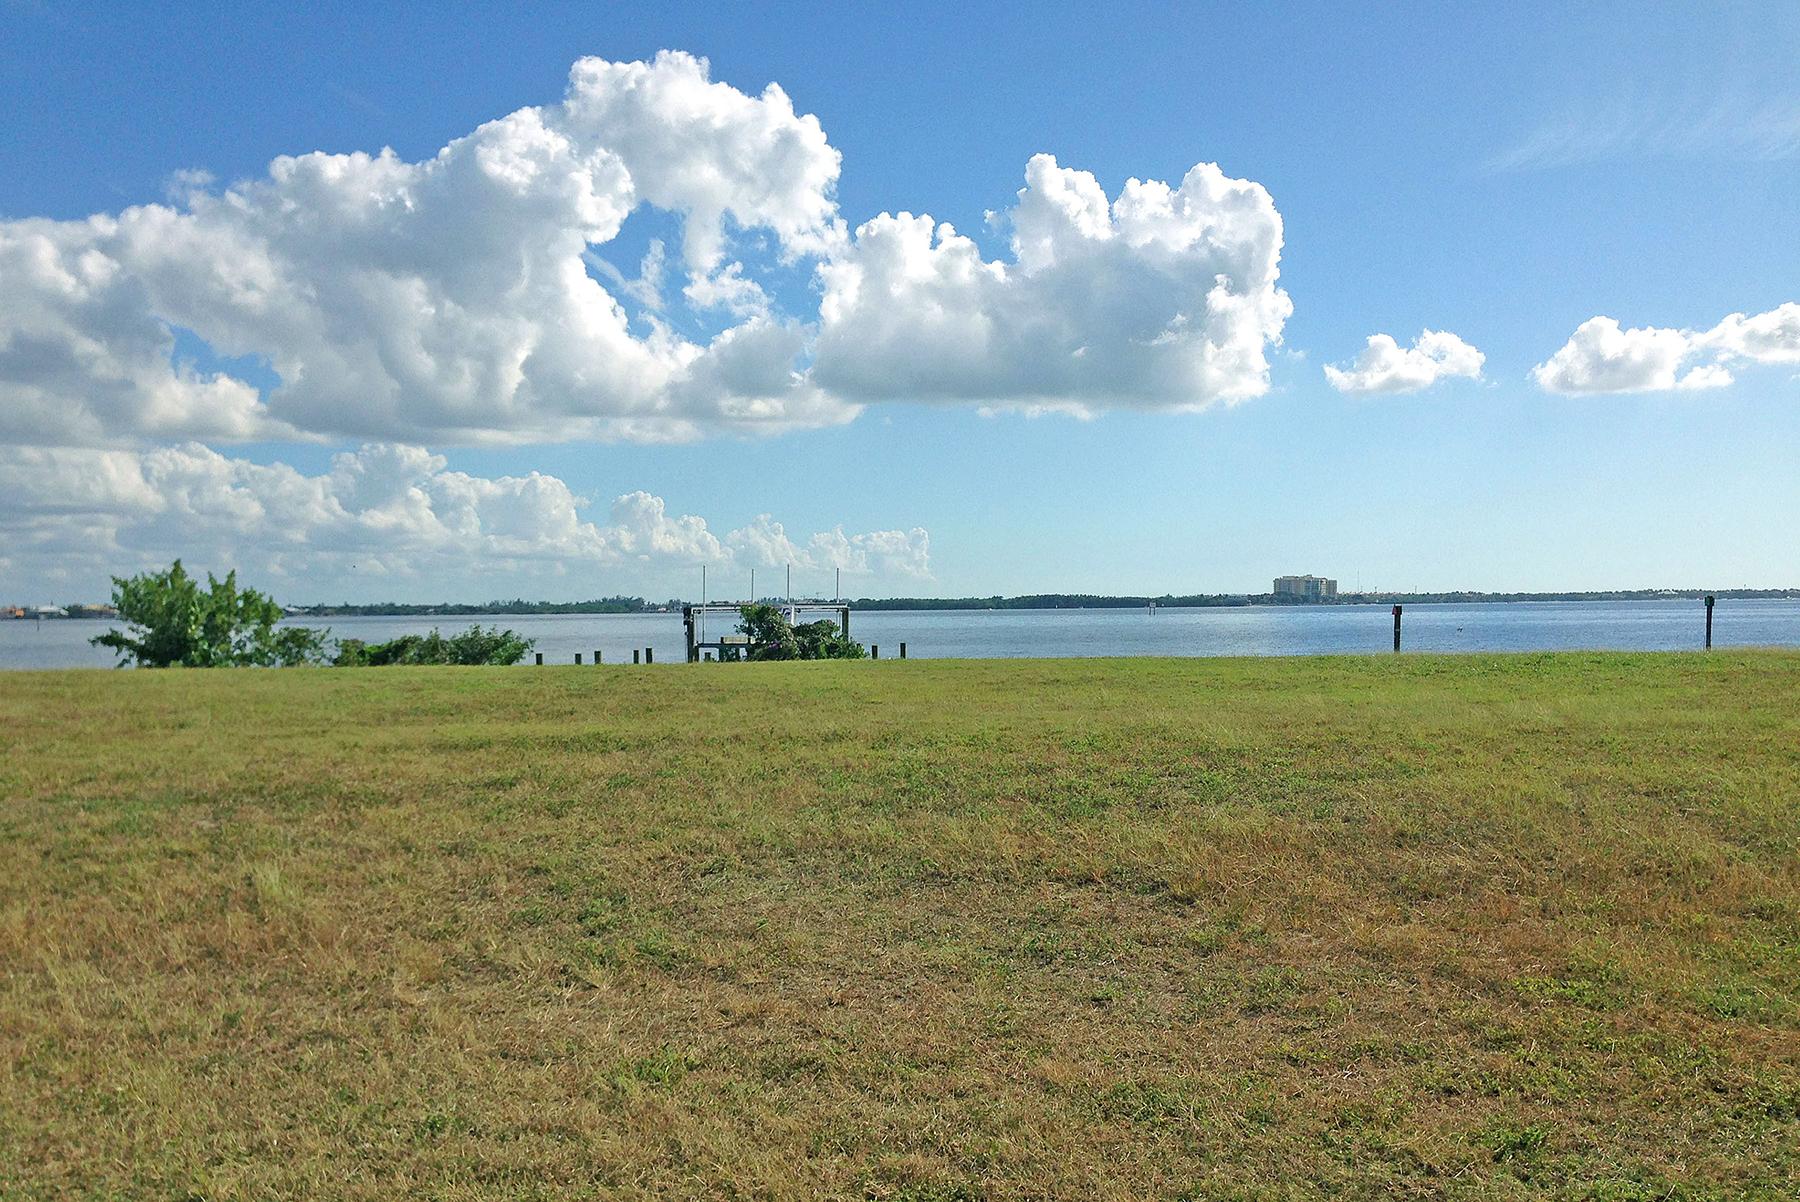 Land for Sale at CAPE CORAL 1617 Edith Esplanade 0220 Cape Coral, Florida 33904 United States